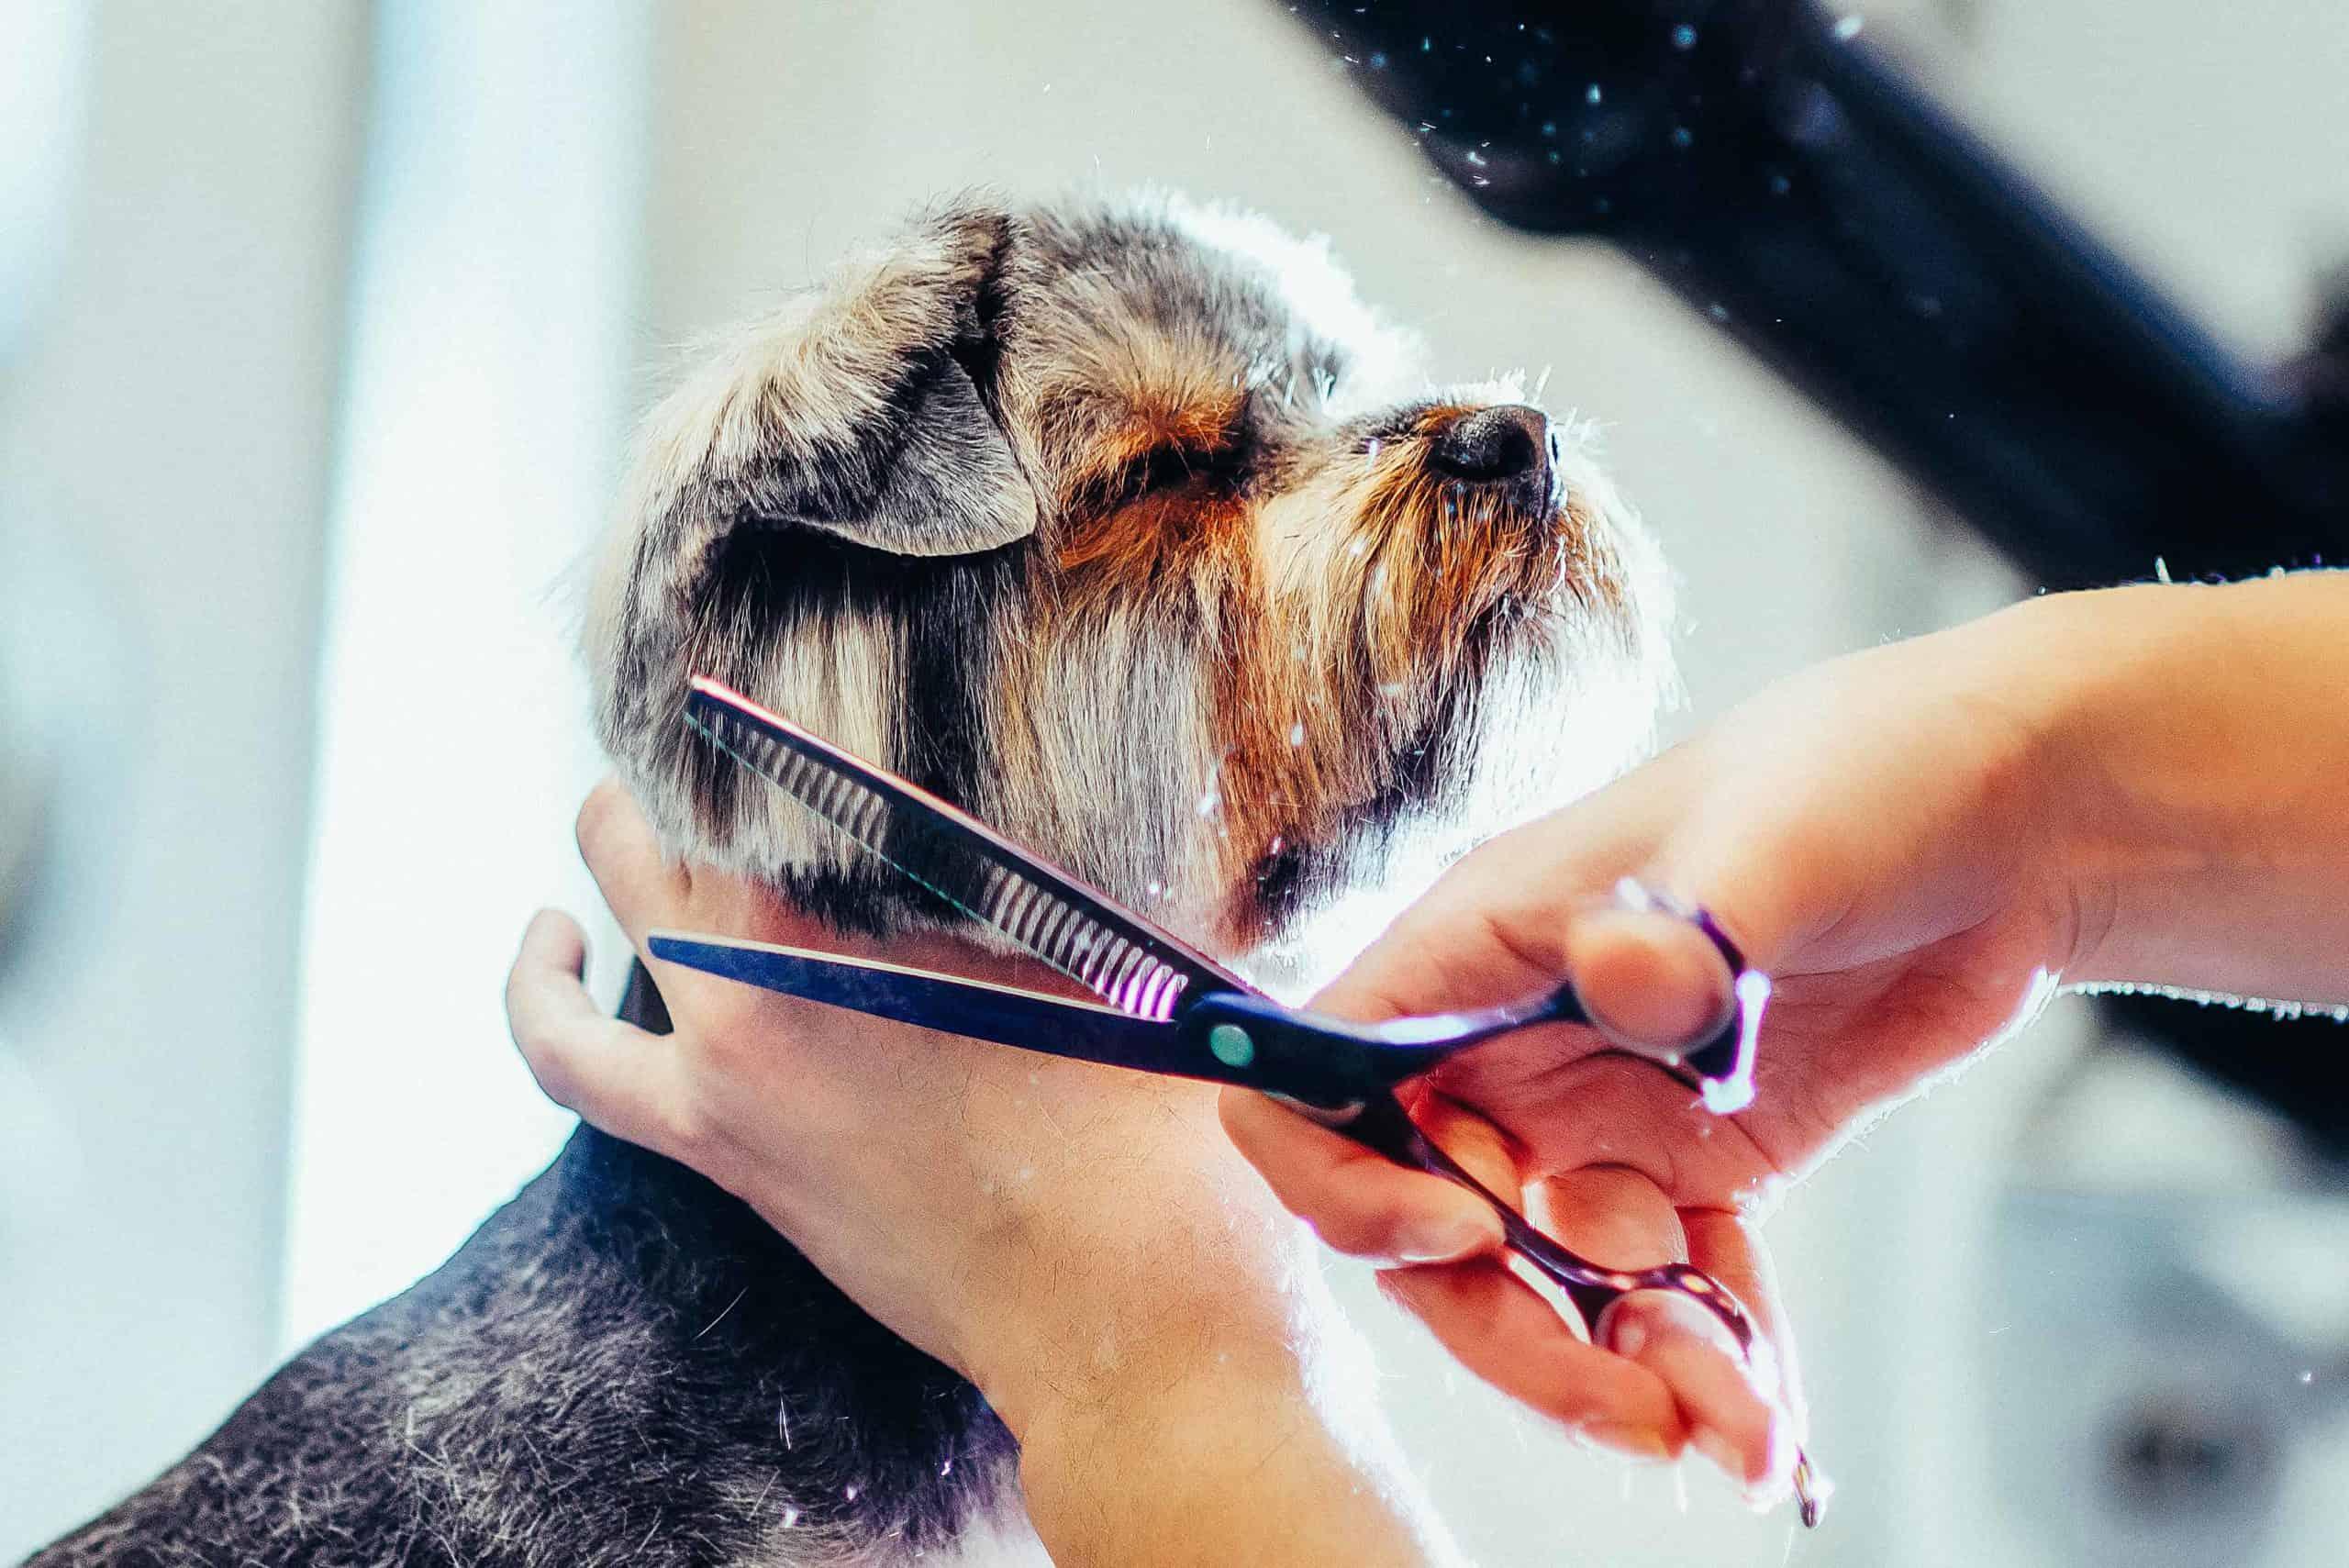 Groomer trims terriers hair with sharp shears. Key dog grooming tools include sharp shears.